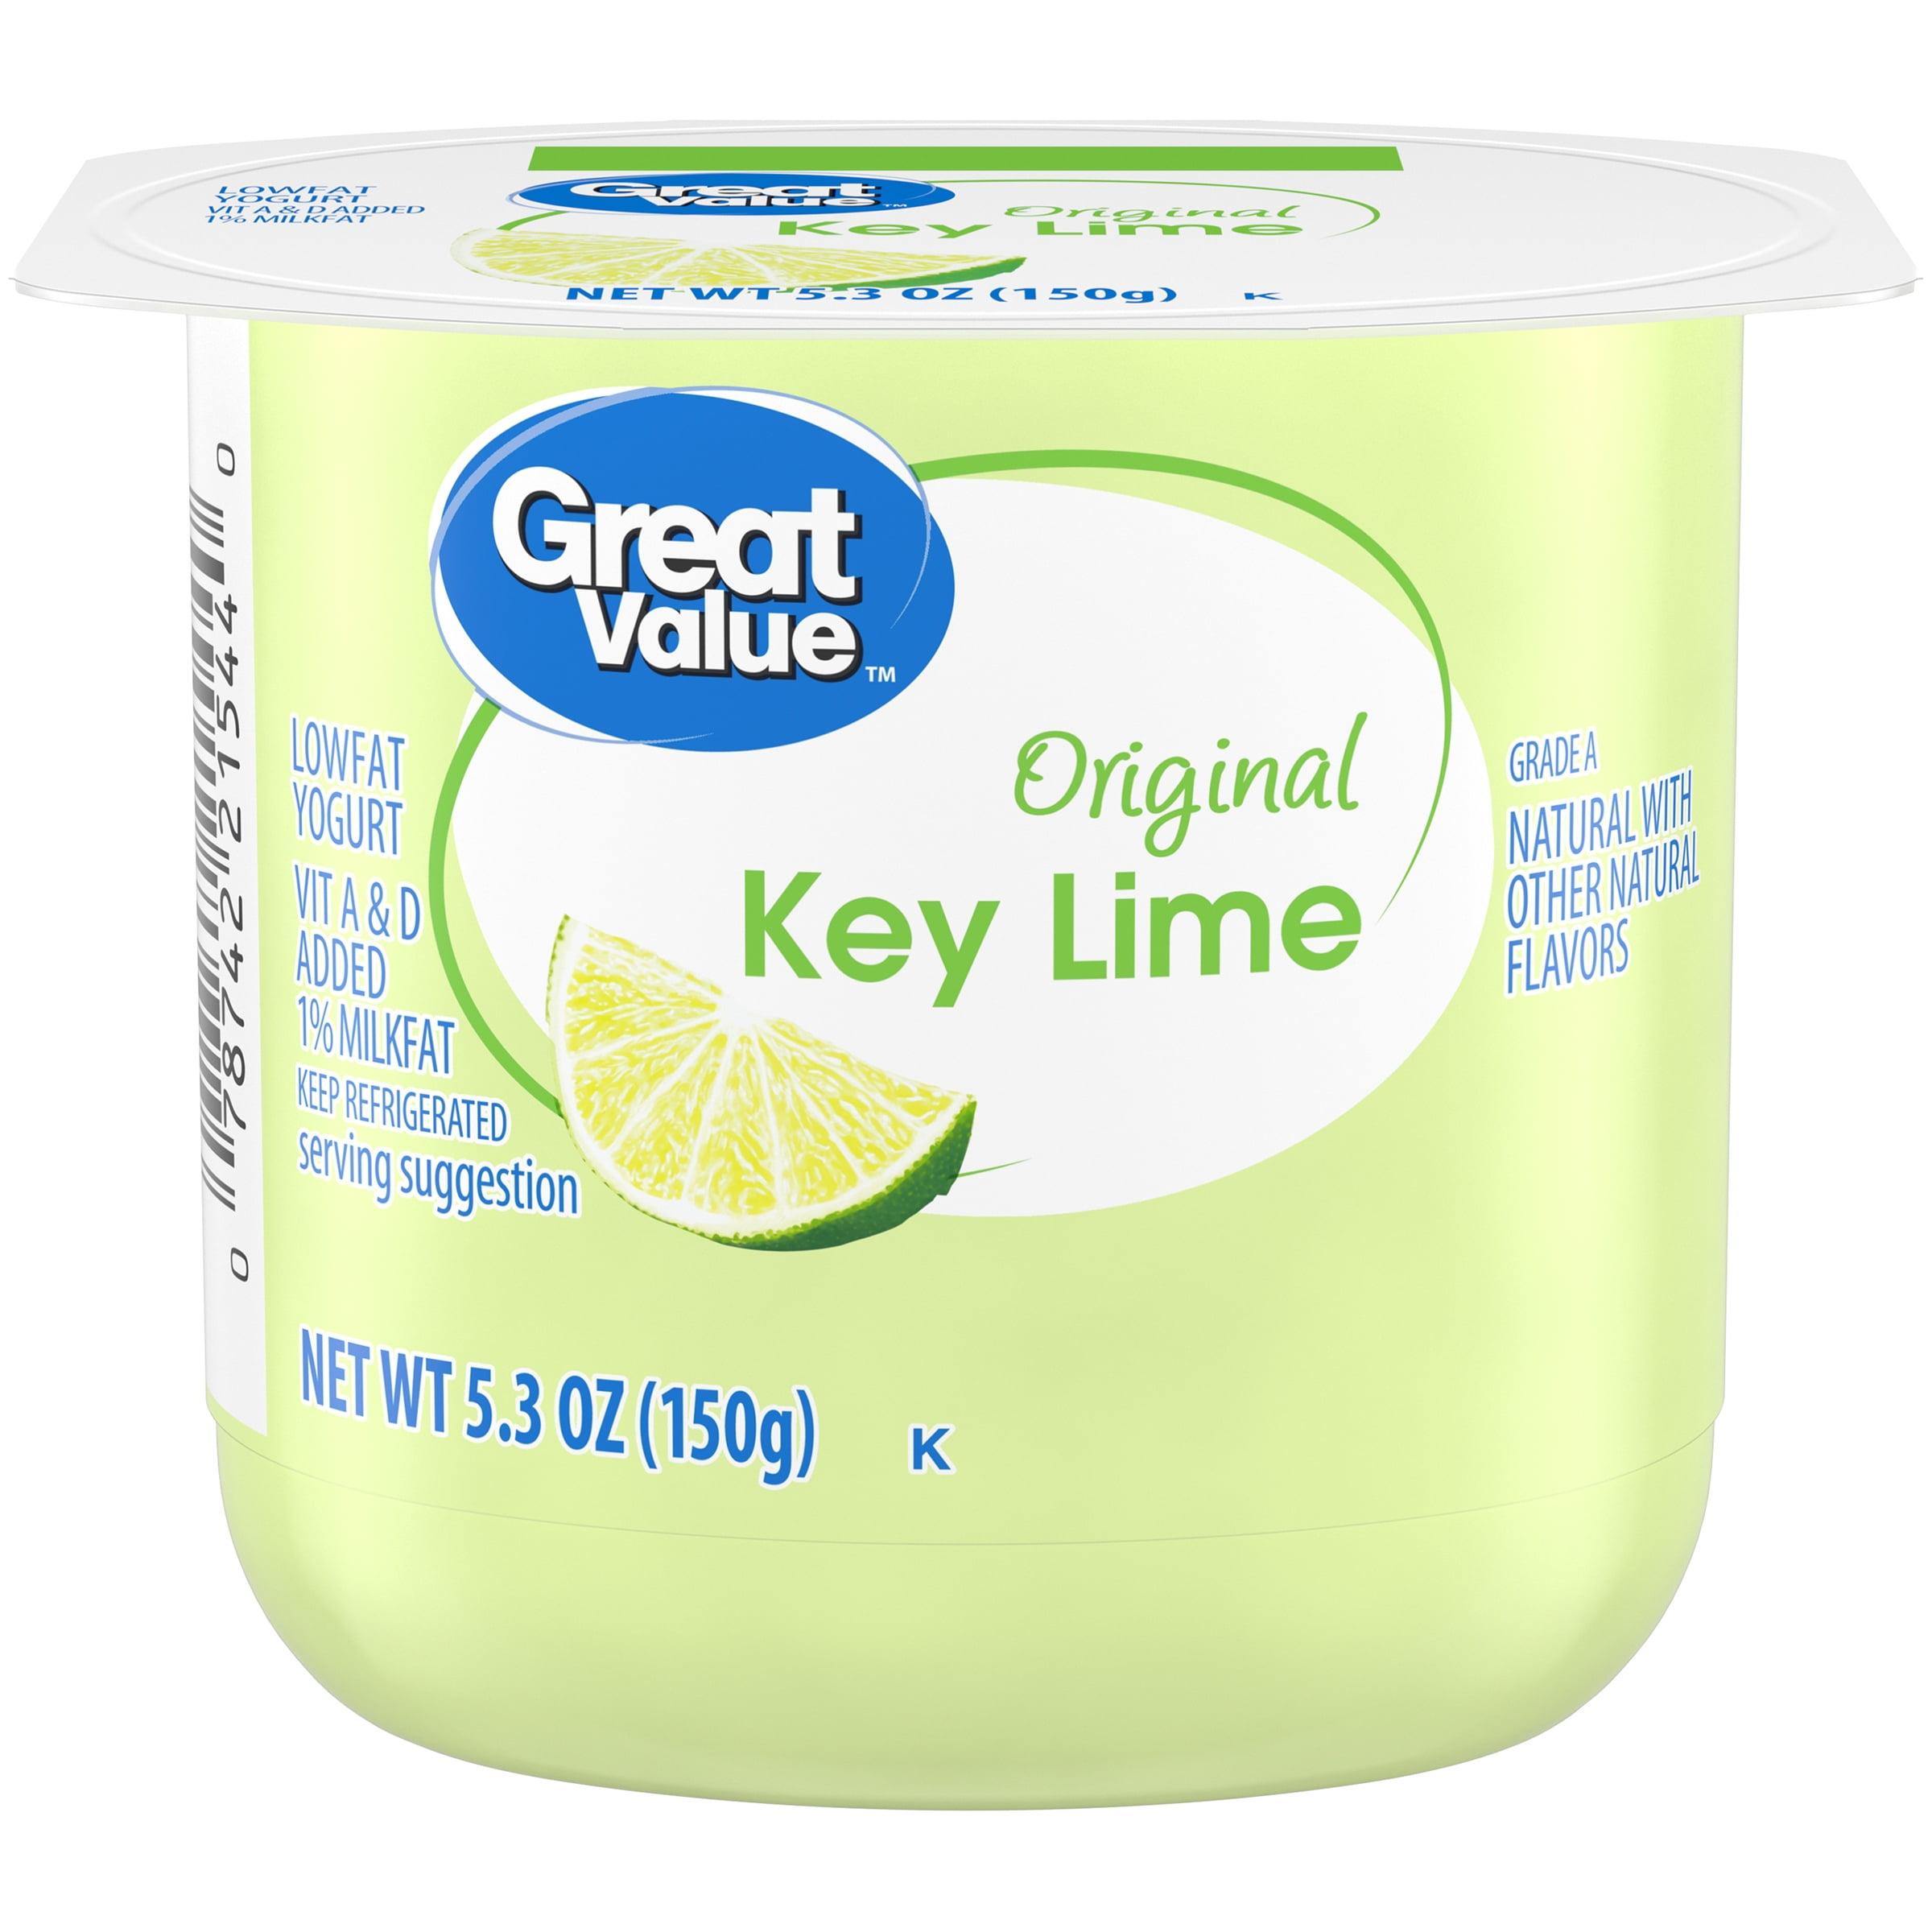 Great Value™ Original Key Lime Lowfat Yogurt 5.3 oz. Cup